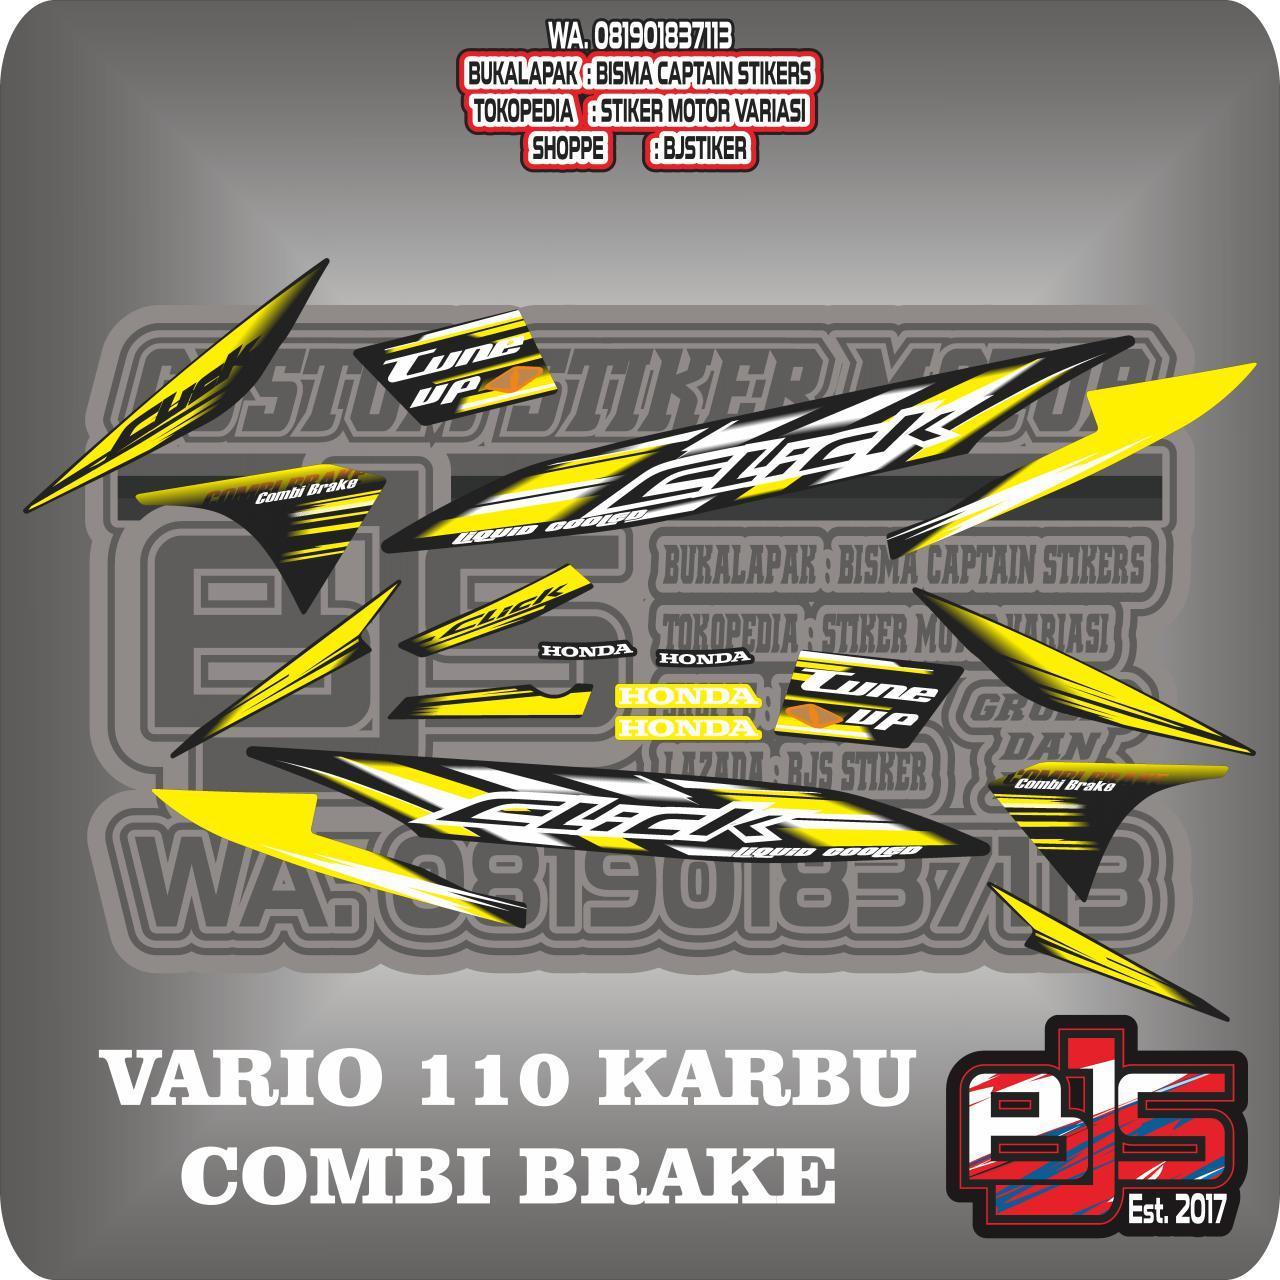 Detail gambar stiker striping list motor vario 110 karbu click combi brake terbaru